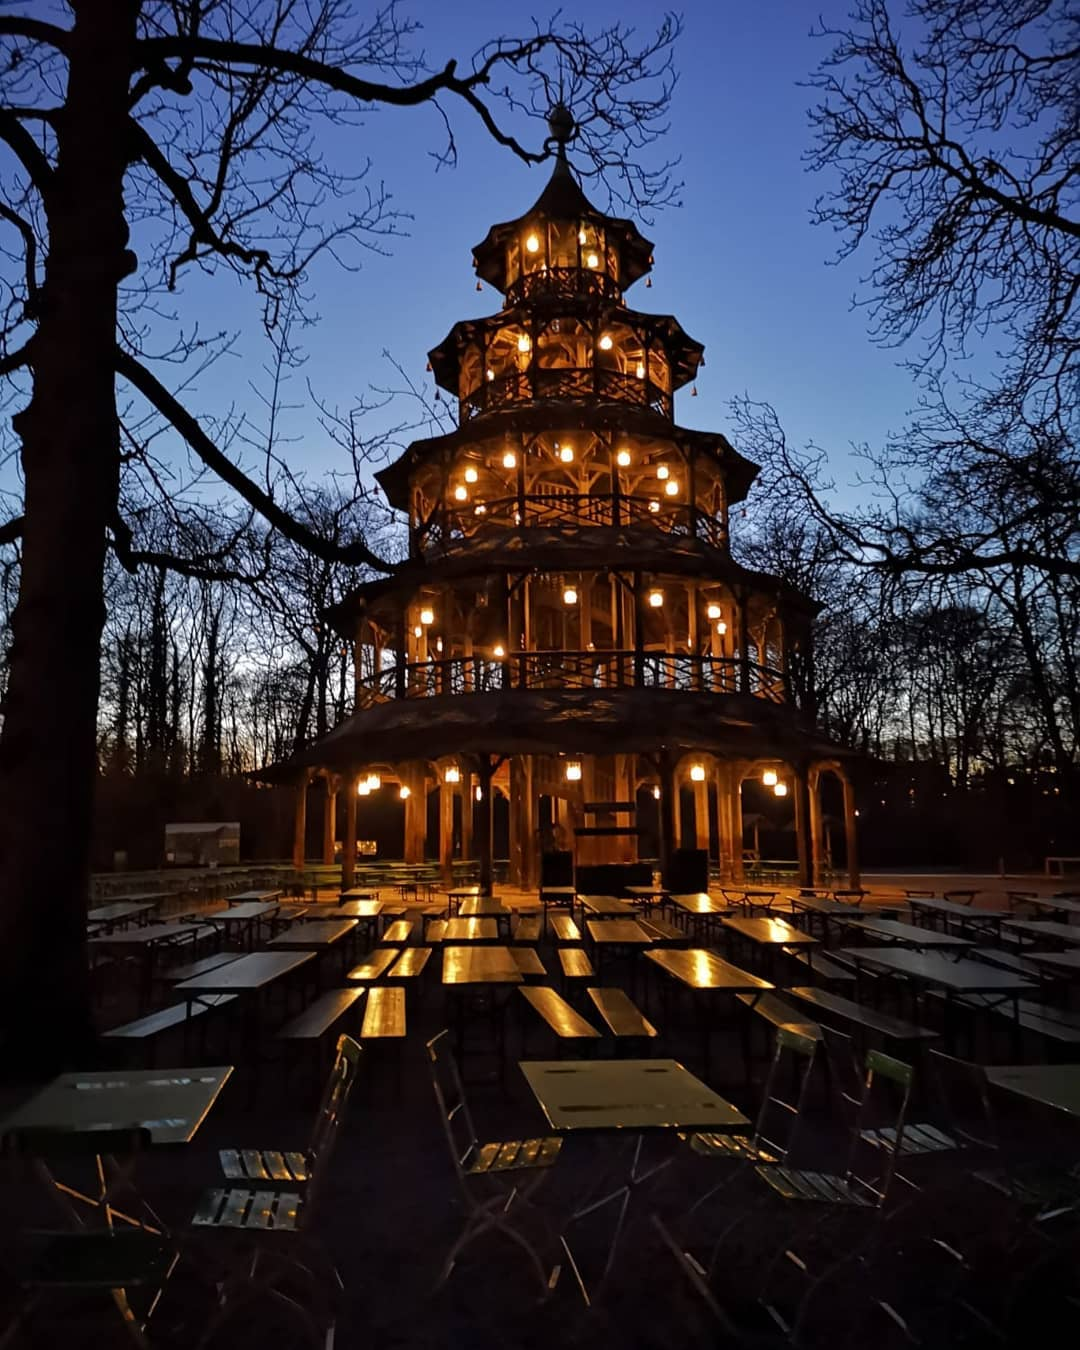 Biergarten della torre cinese